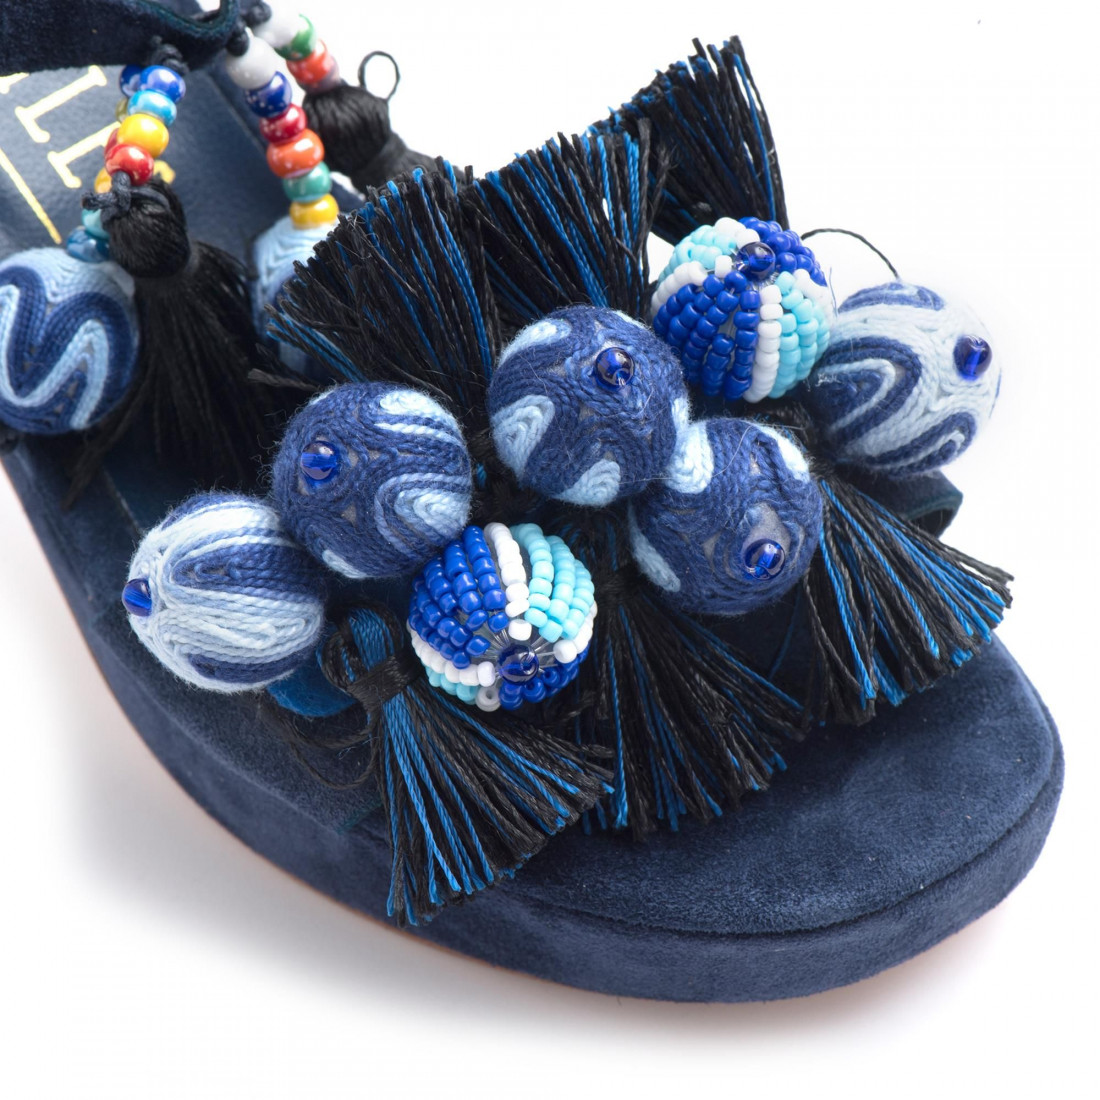 sandals woman les etoiles s150415csilk blu 3388